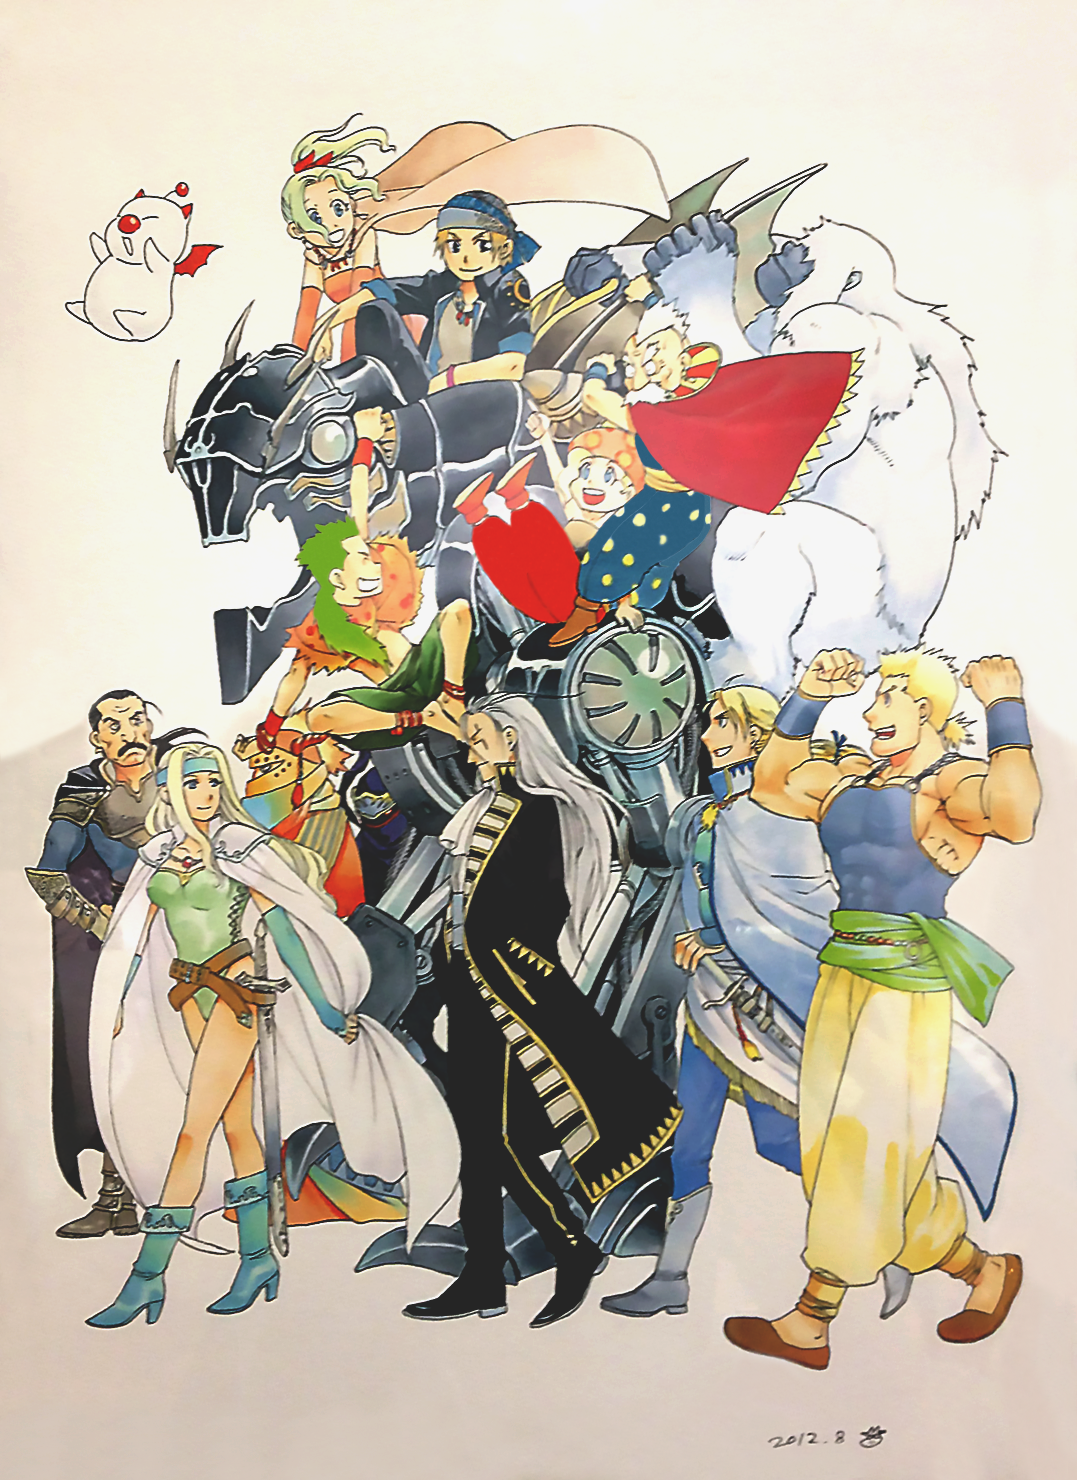 Final Fantasy 6 artwork by Hiromu Arakawa  illustration  FF6  56ca20cdc6d